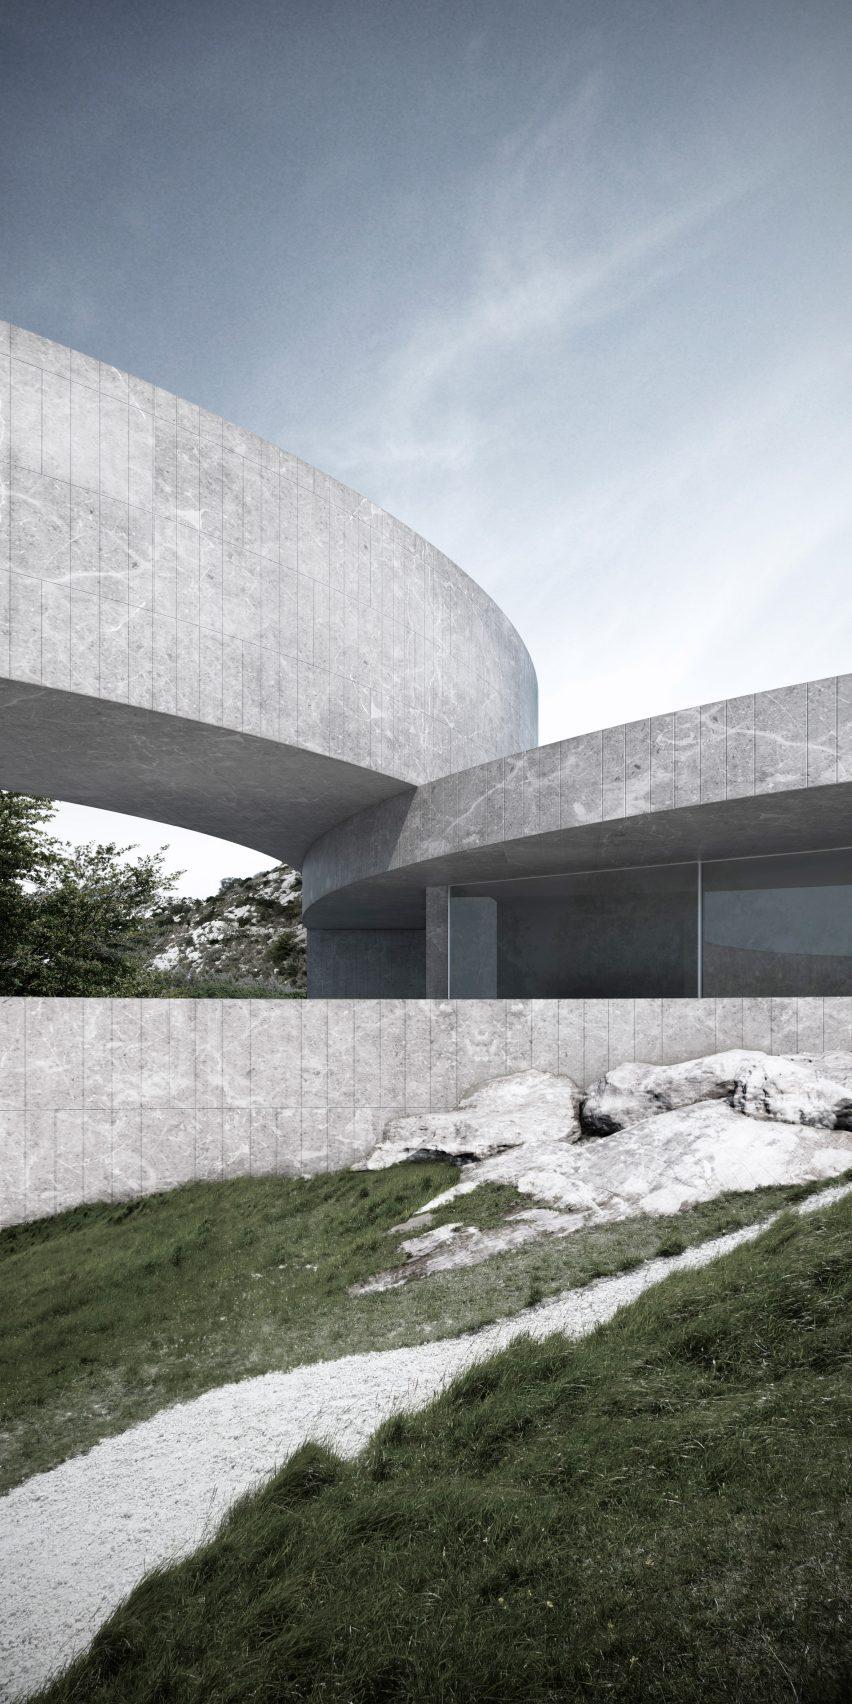 House of Seven gardens by Fran Silvestre Arquitectos